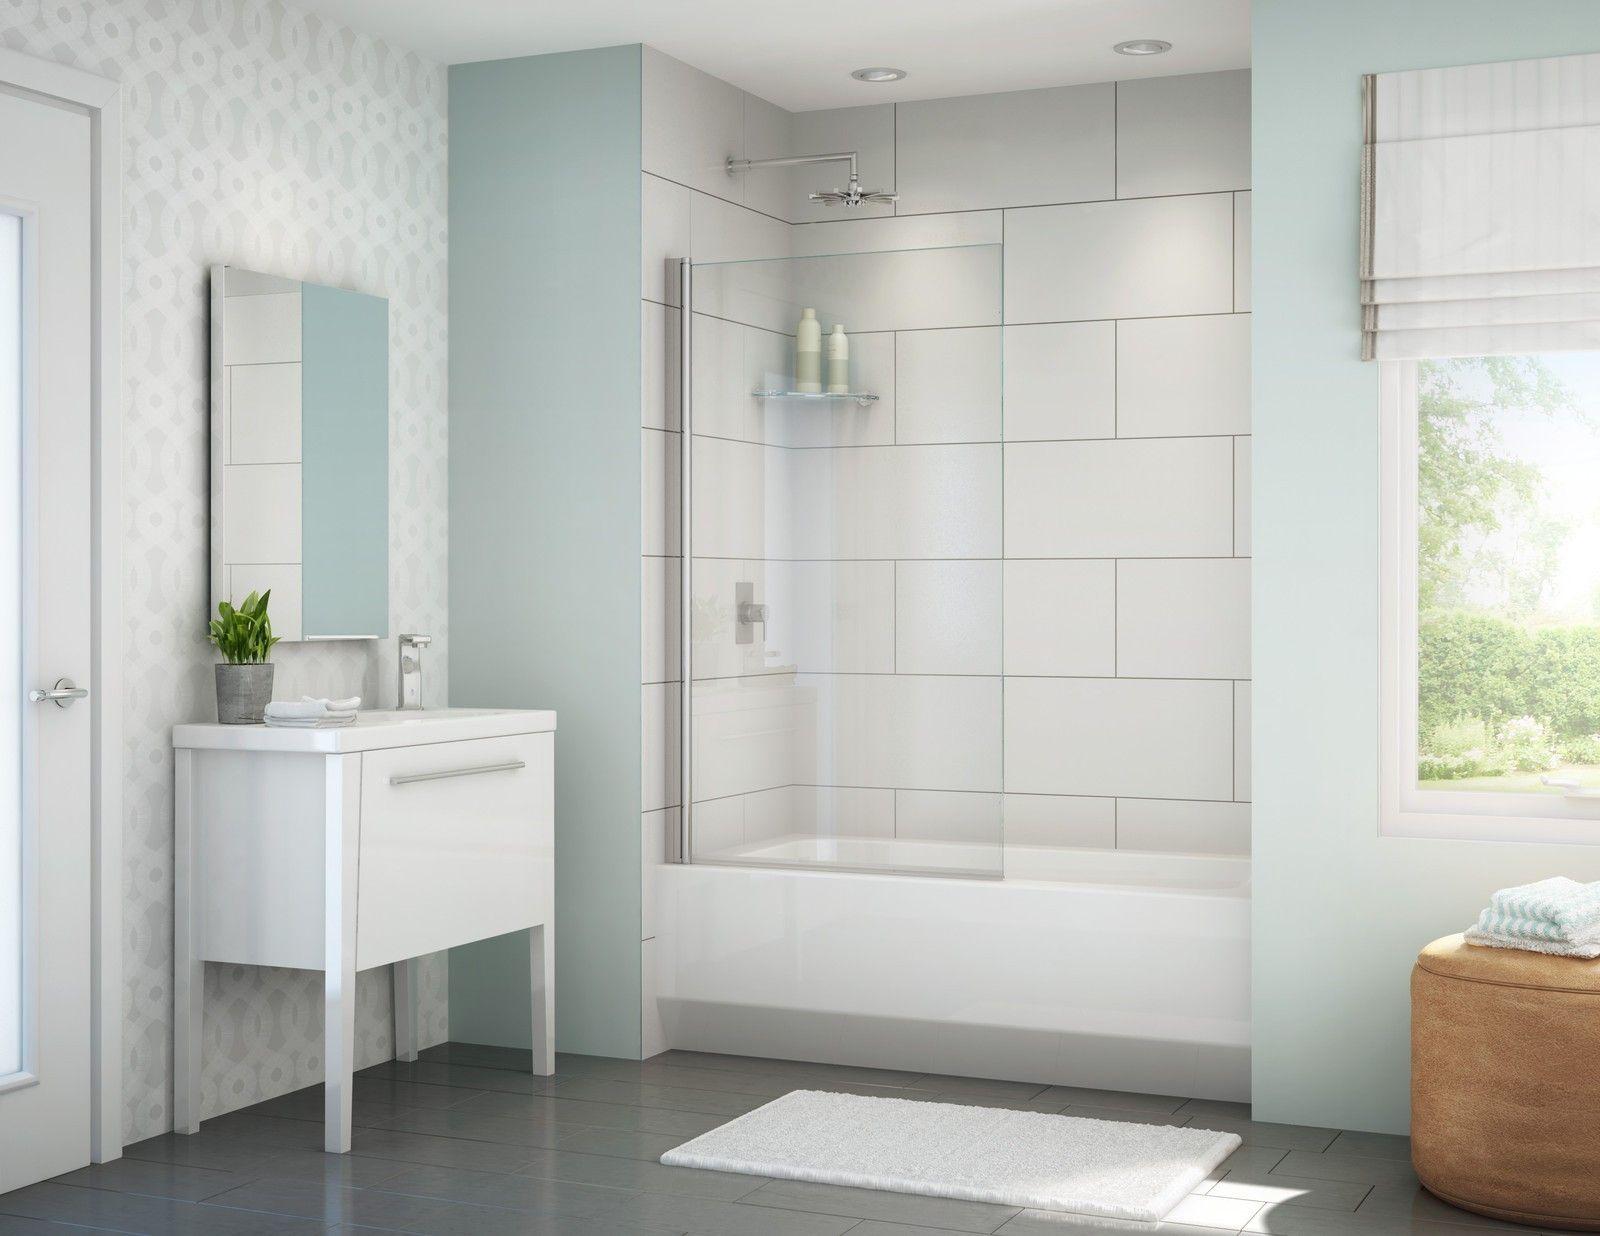 tub shield (bought) | bathroom | Pinterest | Tubs, Bath and Attic ...